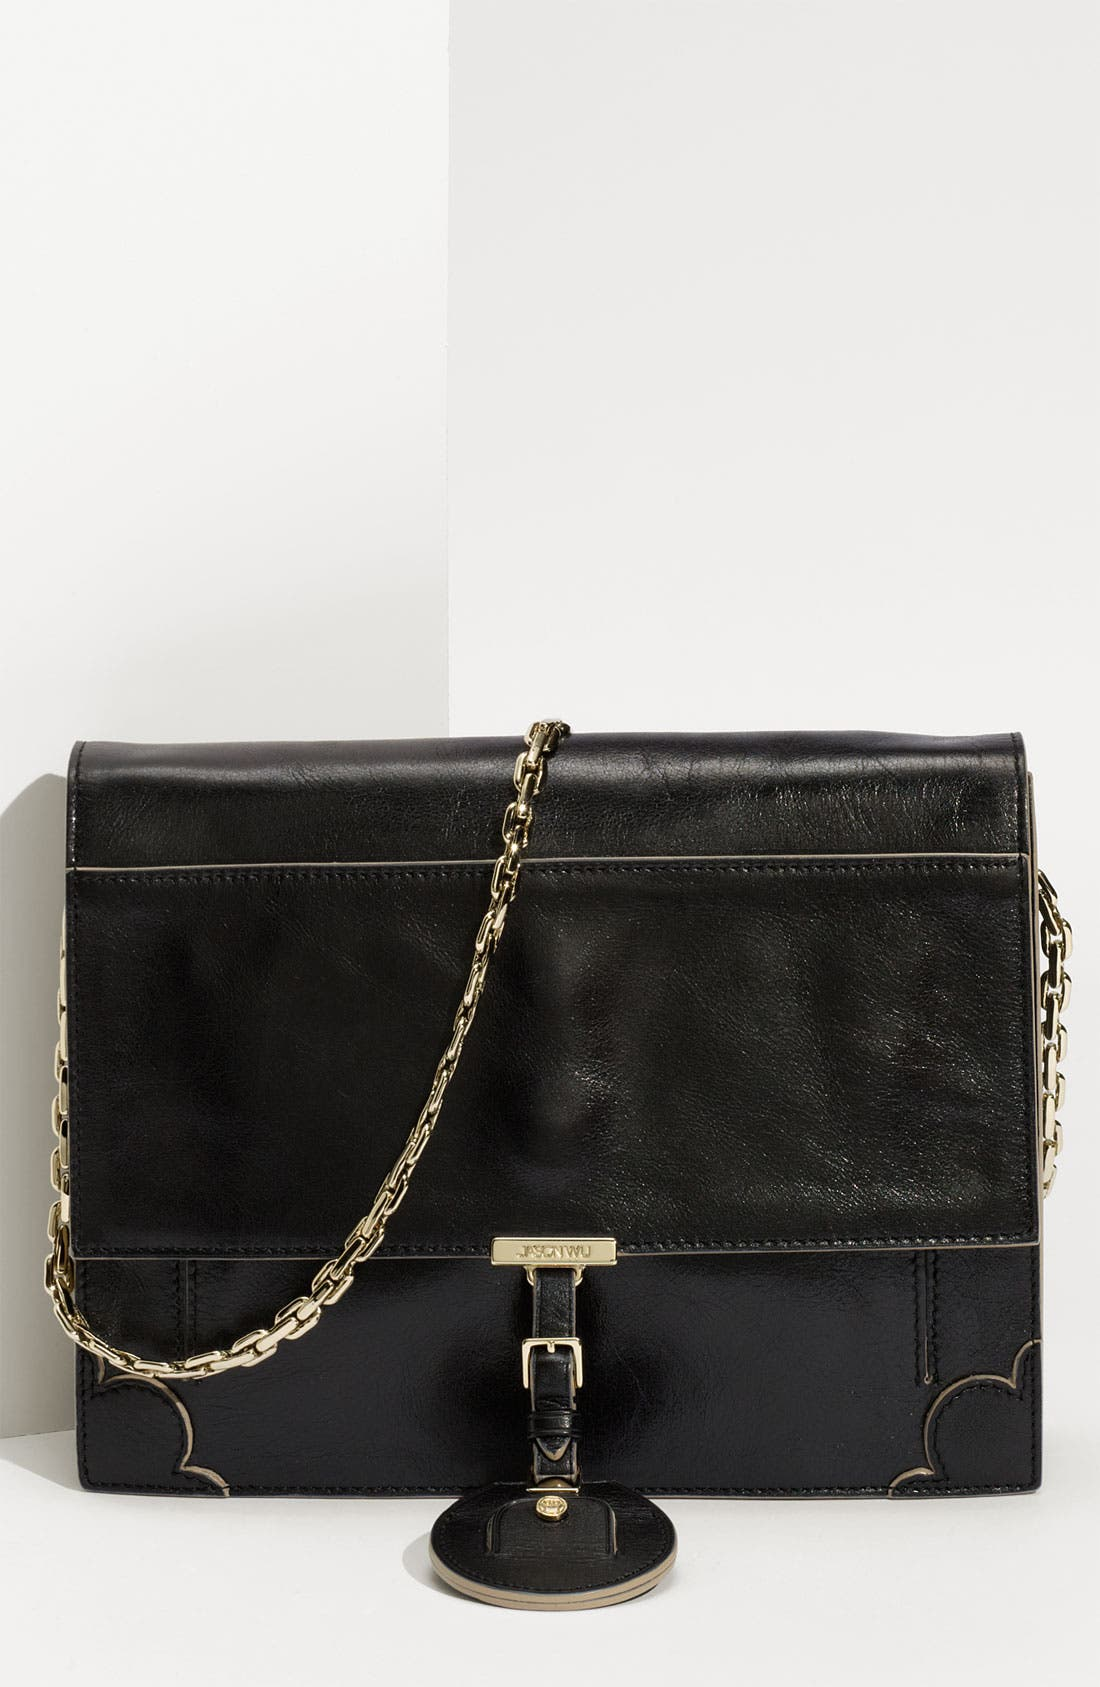 Main Image - Jason Wu 'Jourdan' Calfskin Leather Shoulder Bag